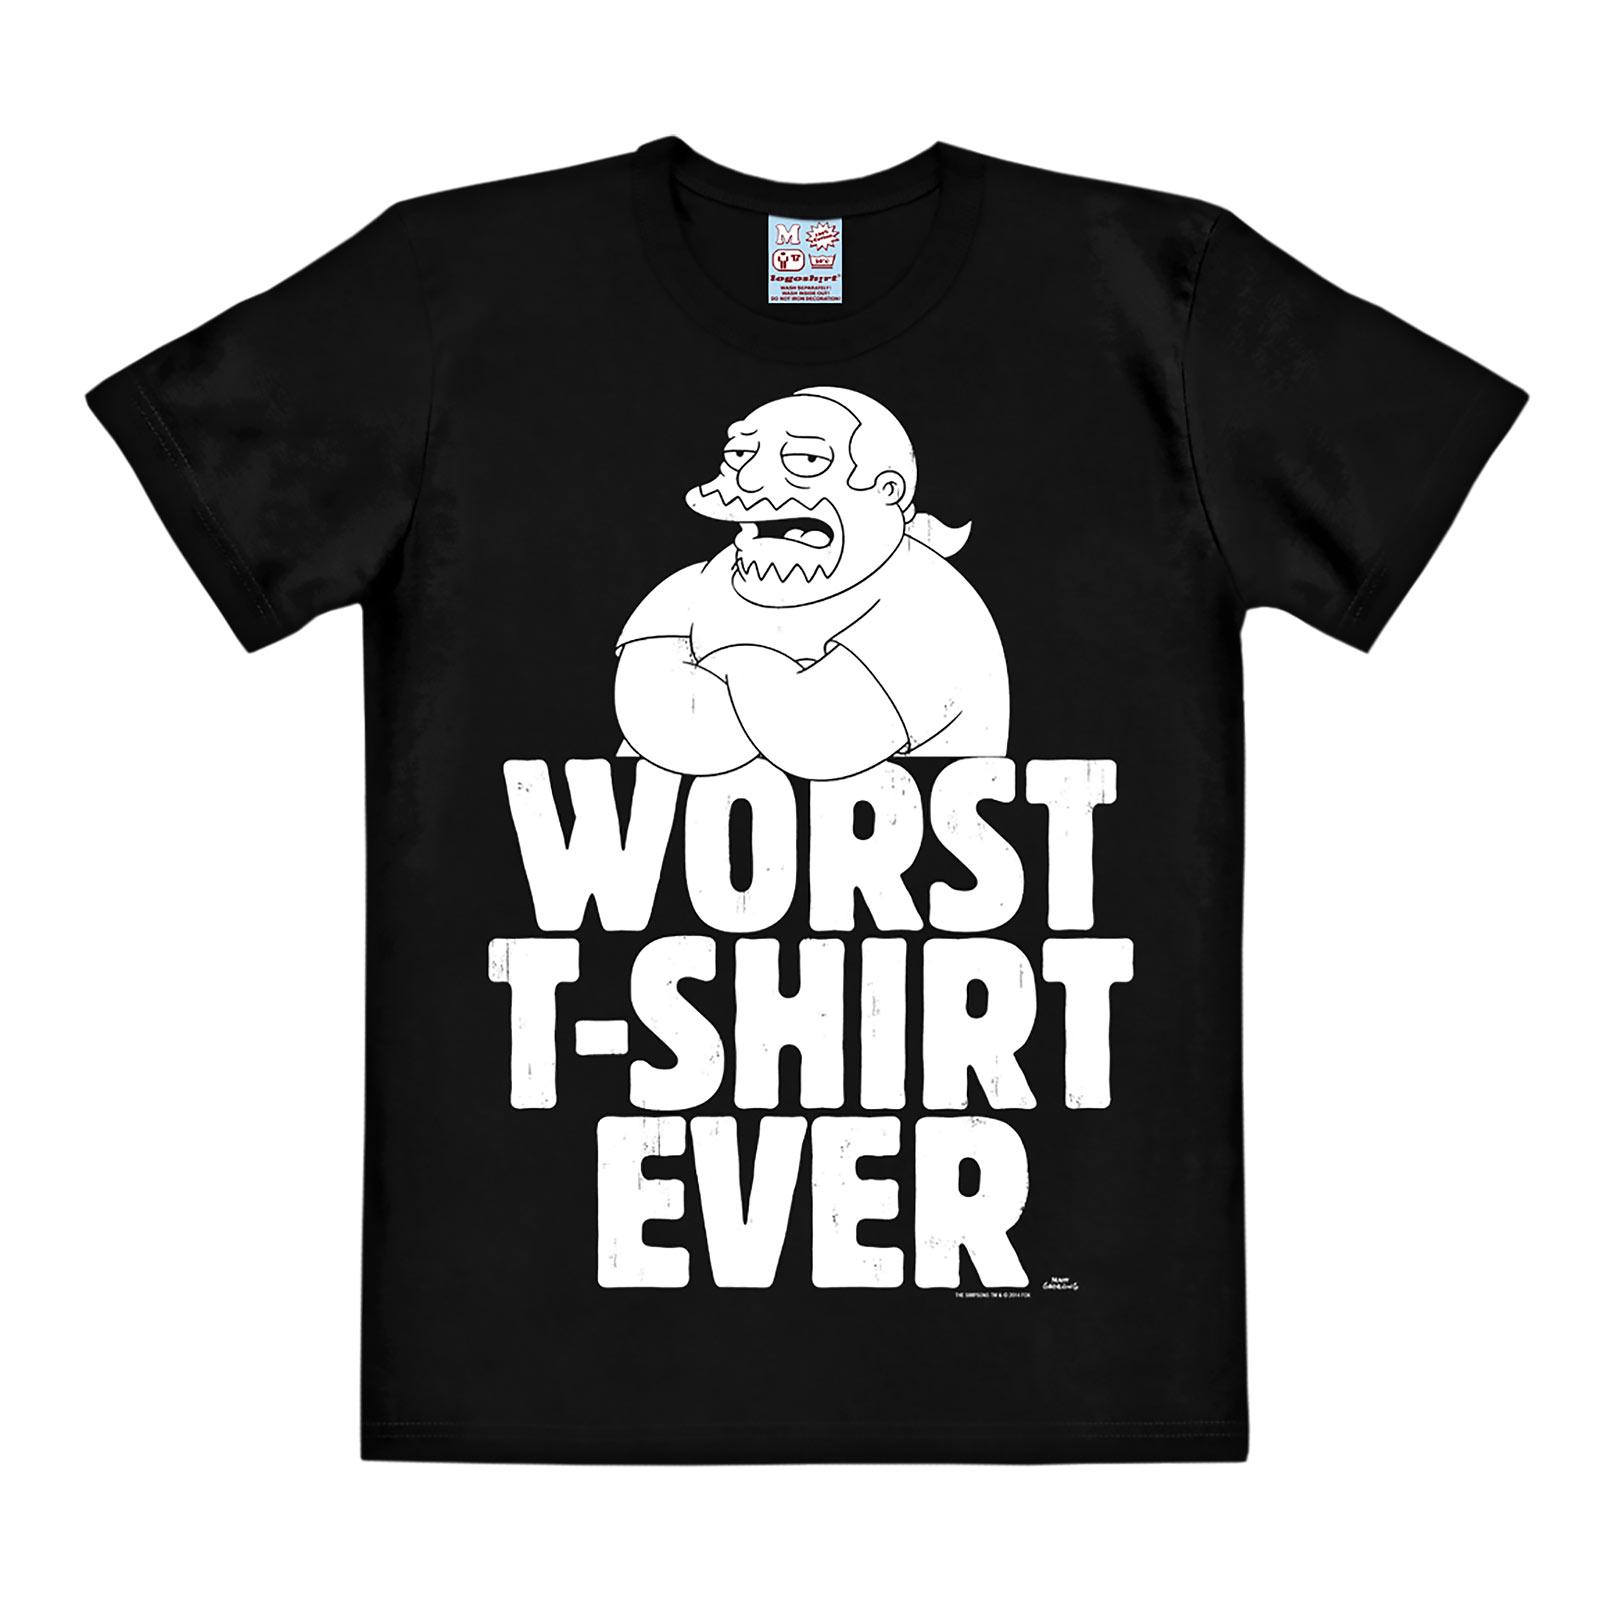 Simpsons - Worst T-Shirt Ever schwarz